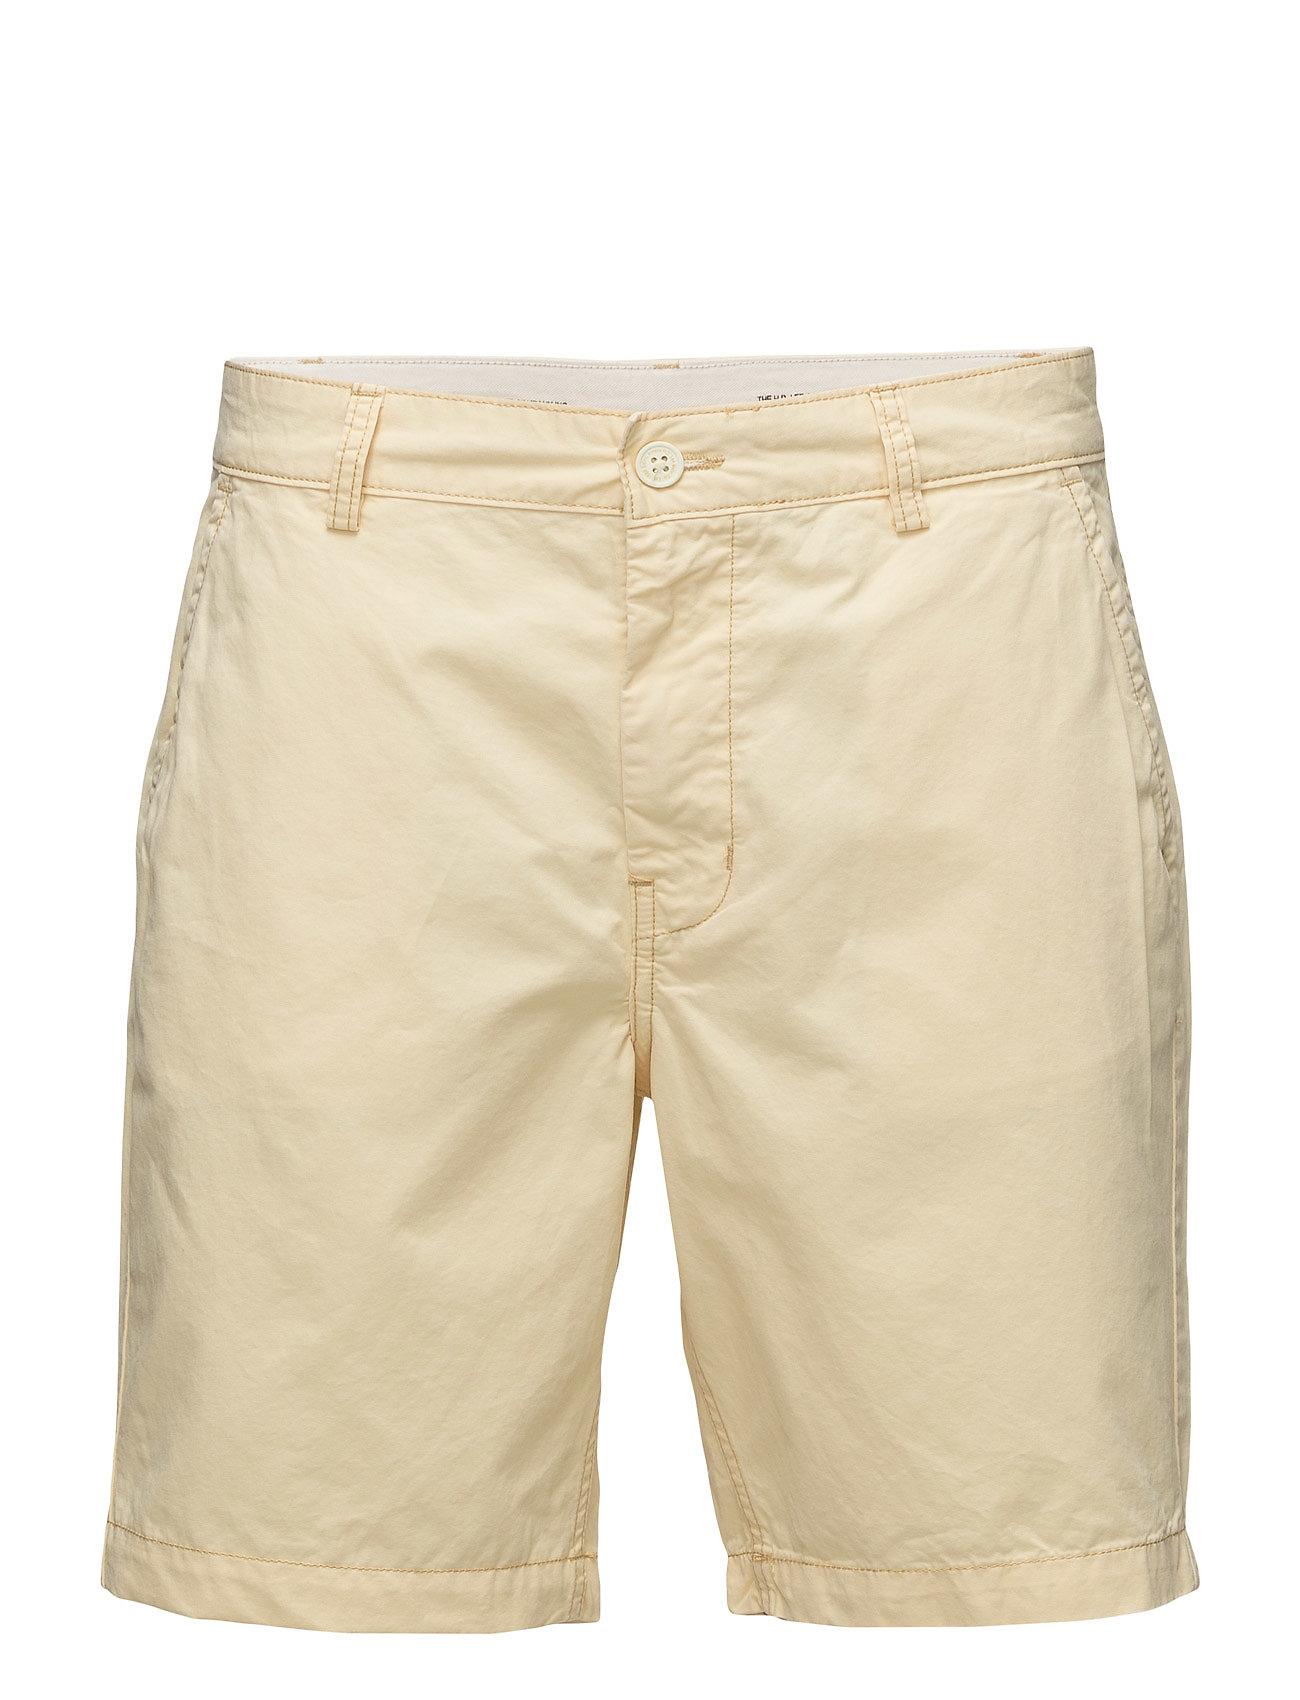 Chino Short Yellow Lee Jeans Bermuda shorts til Herrer i Gul